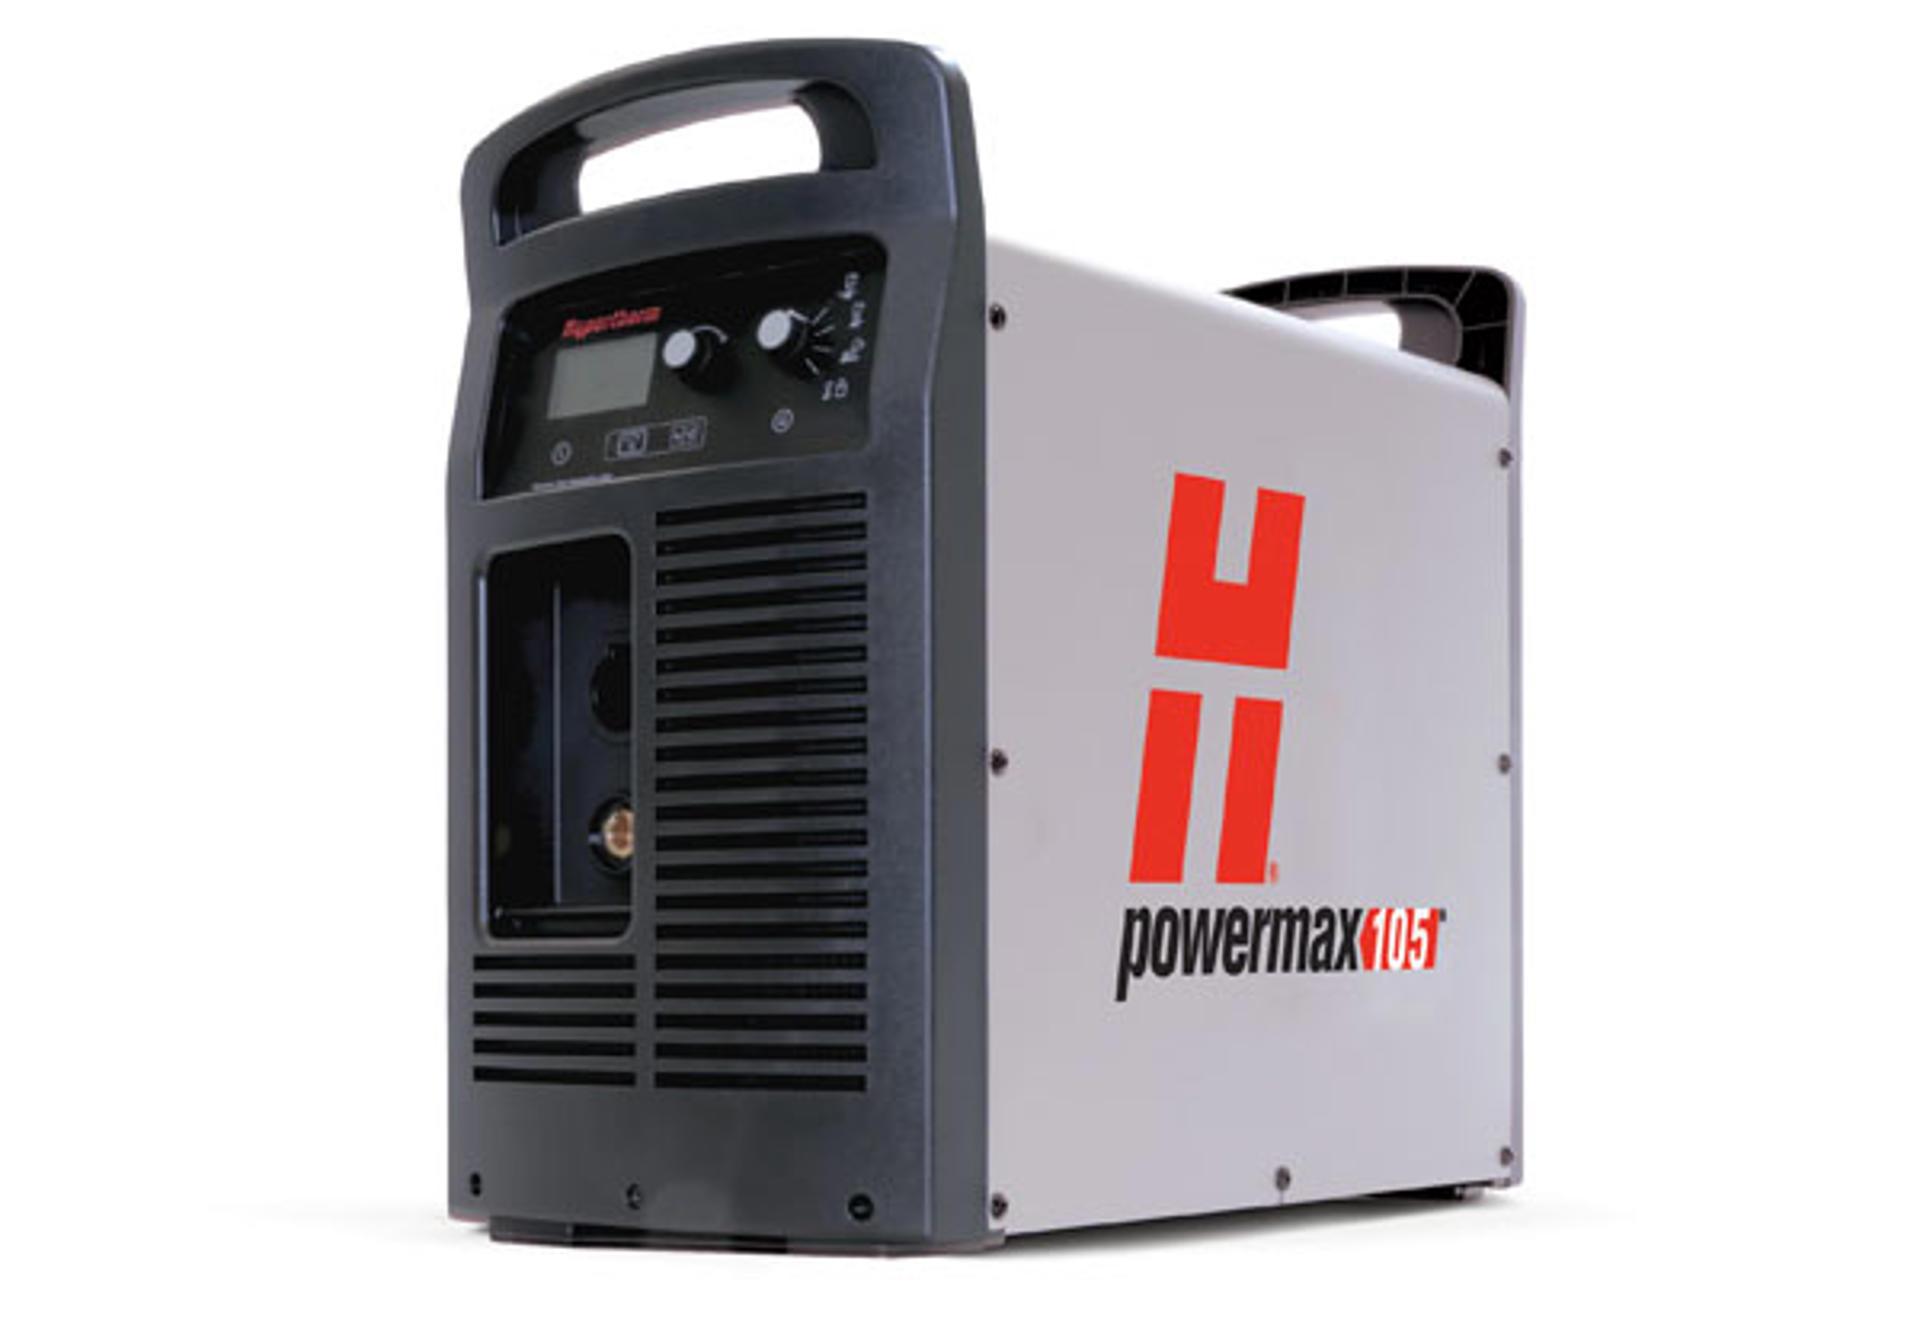 Hypertherm powermax 600 plasma cutter repair and tune up youtube.